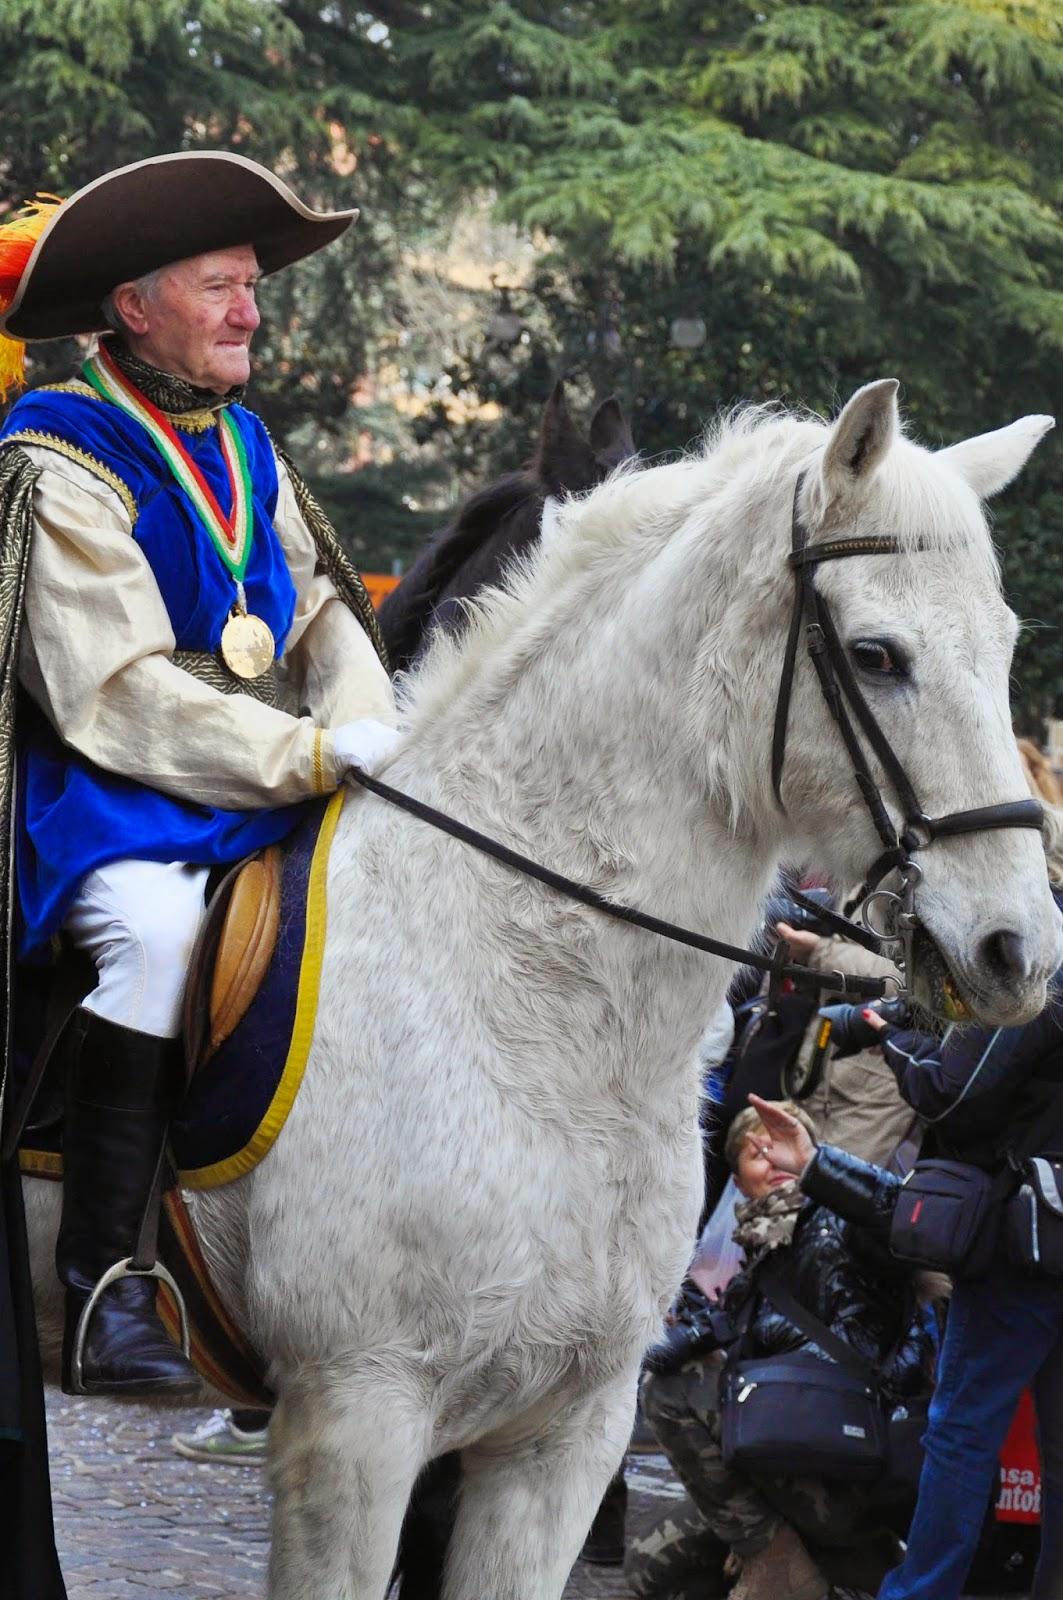 A man in costume at Verona Carnival